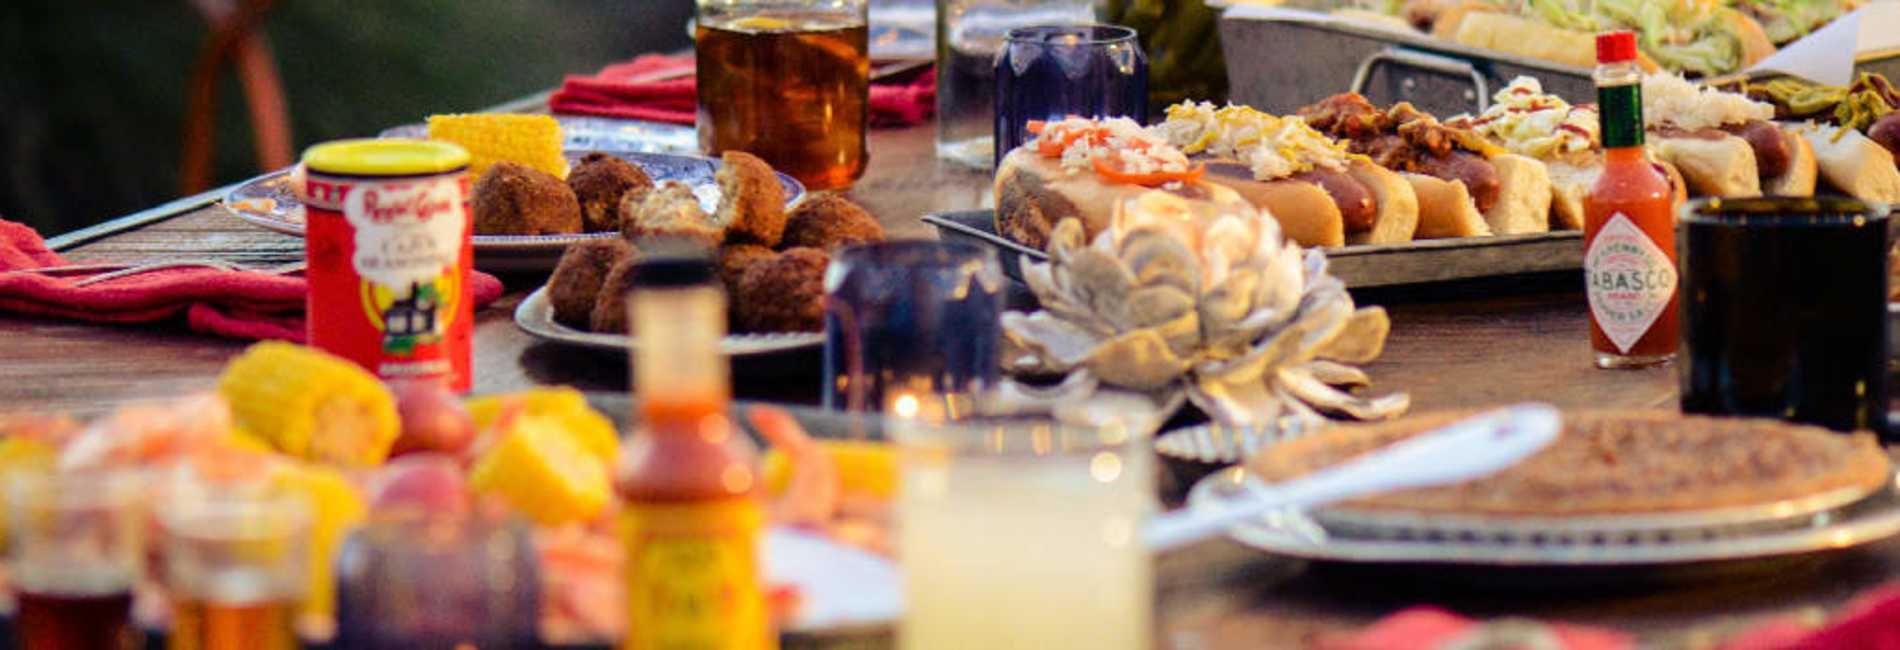 Best Restaurants In Lake Charles View 2019 Top 20 Restaurants